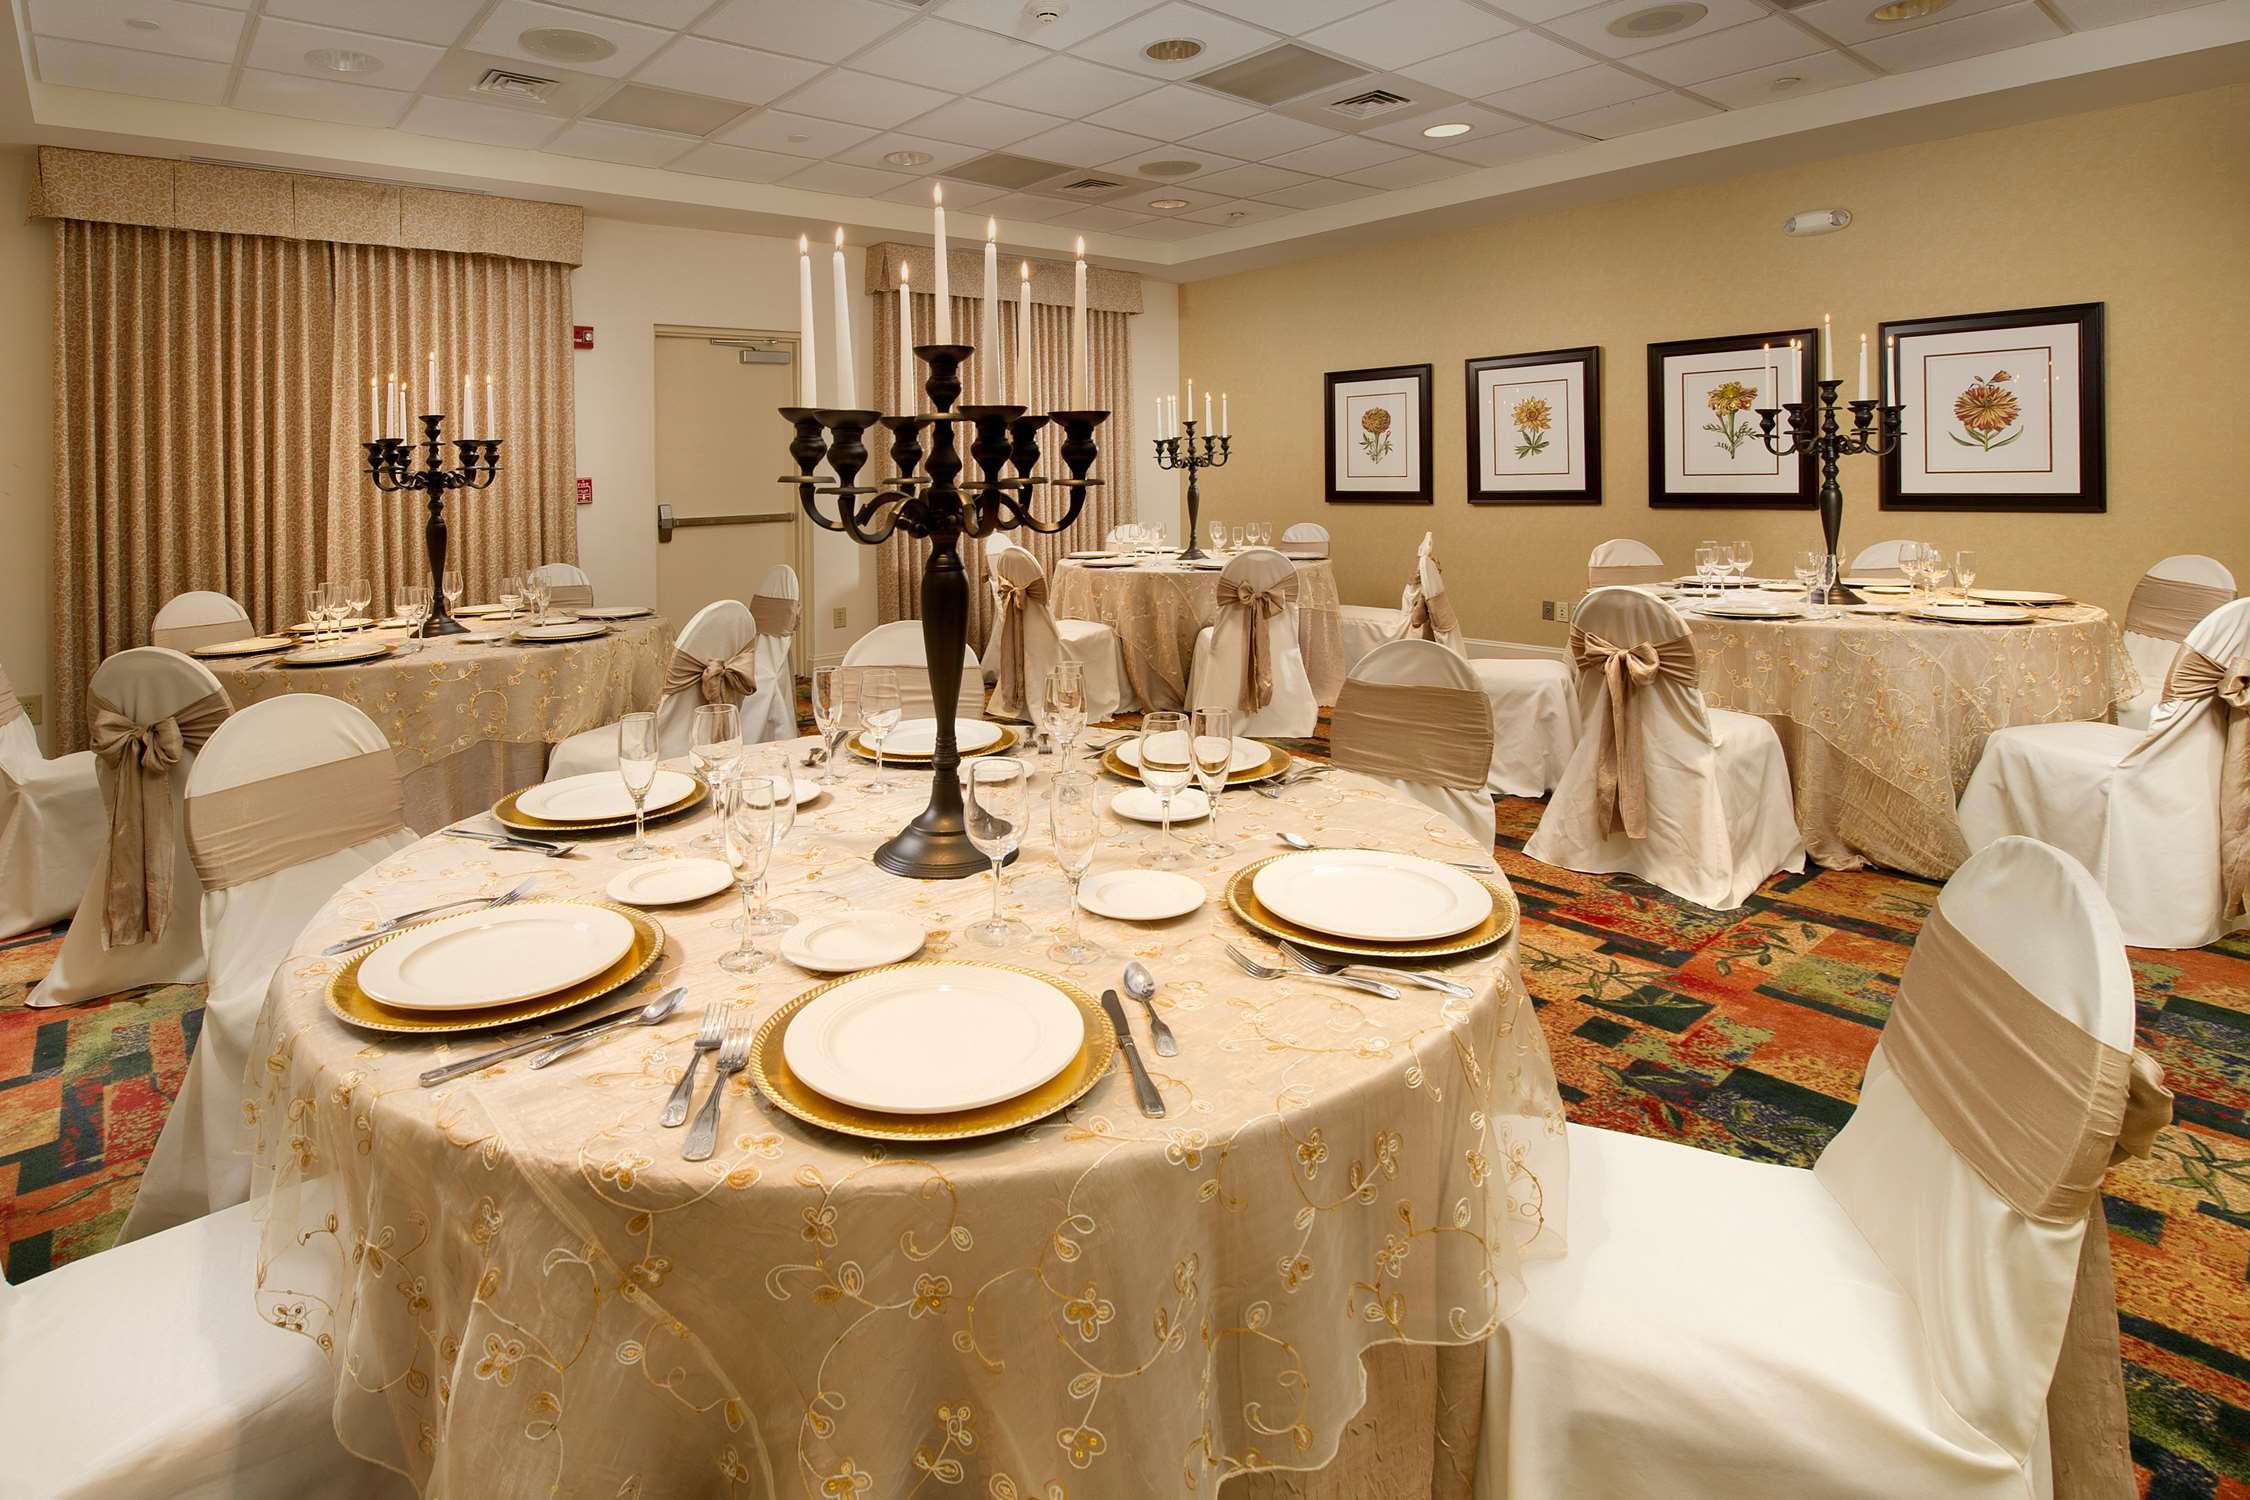 hilton garden inn columbus 1500 bradley lakes boulevard columbus ga hotels motels mapquest - Hilton Garden Inn Columbus Ga